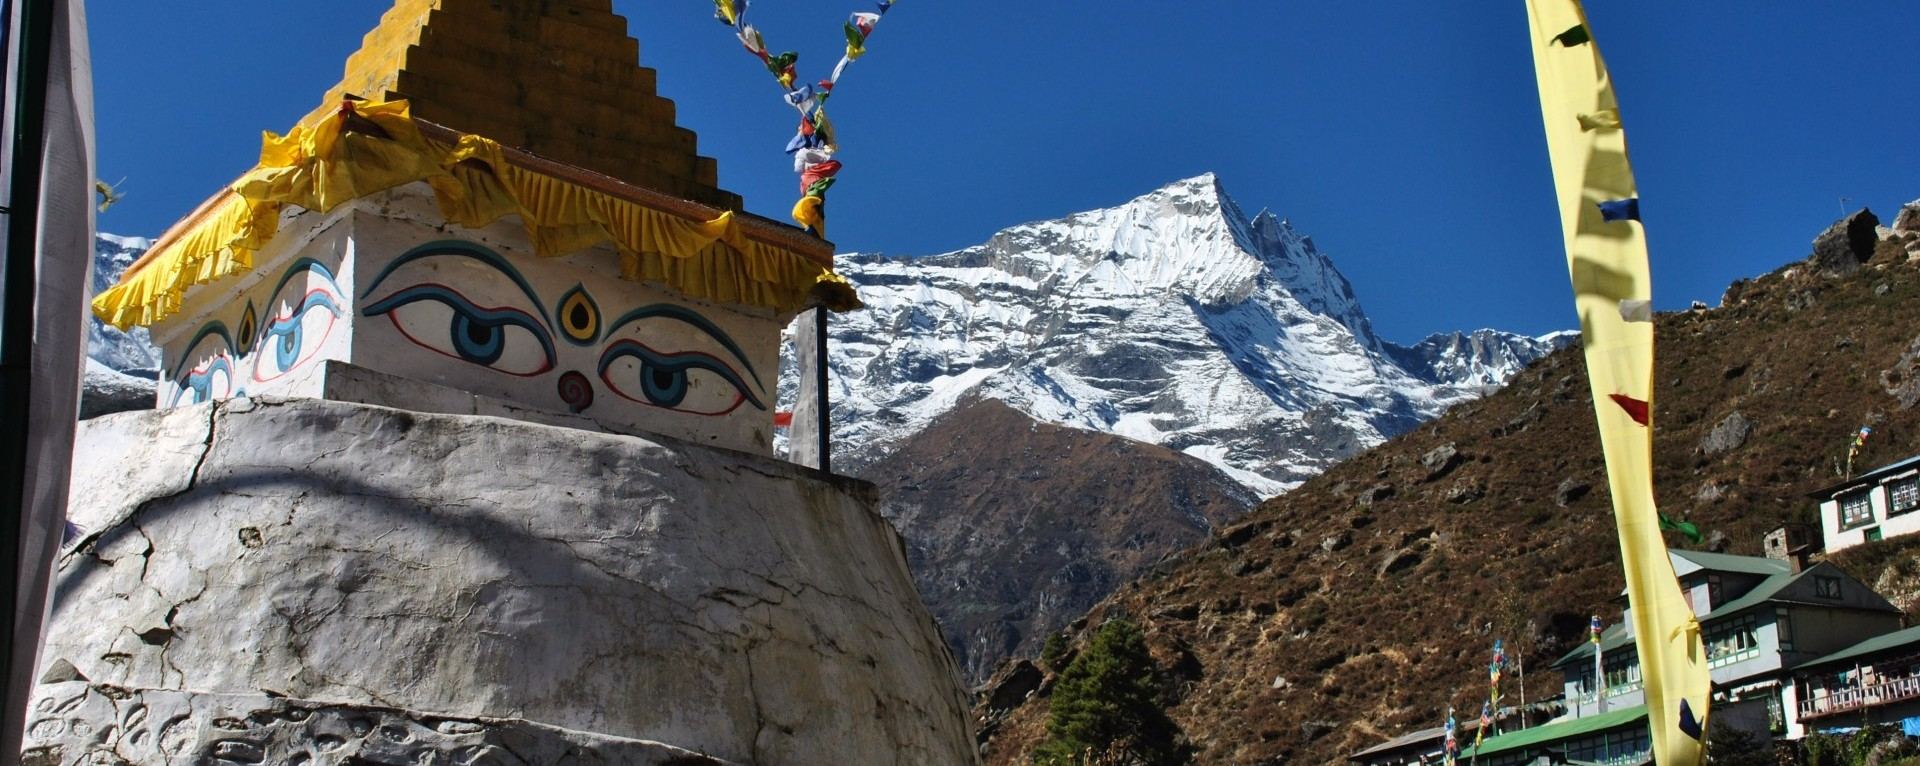 Khumbu trekking, khumbu valley trekking, monastry in everest